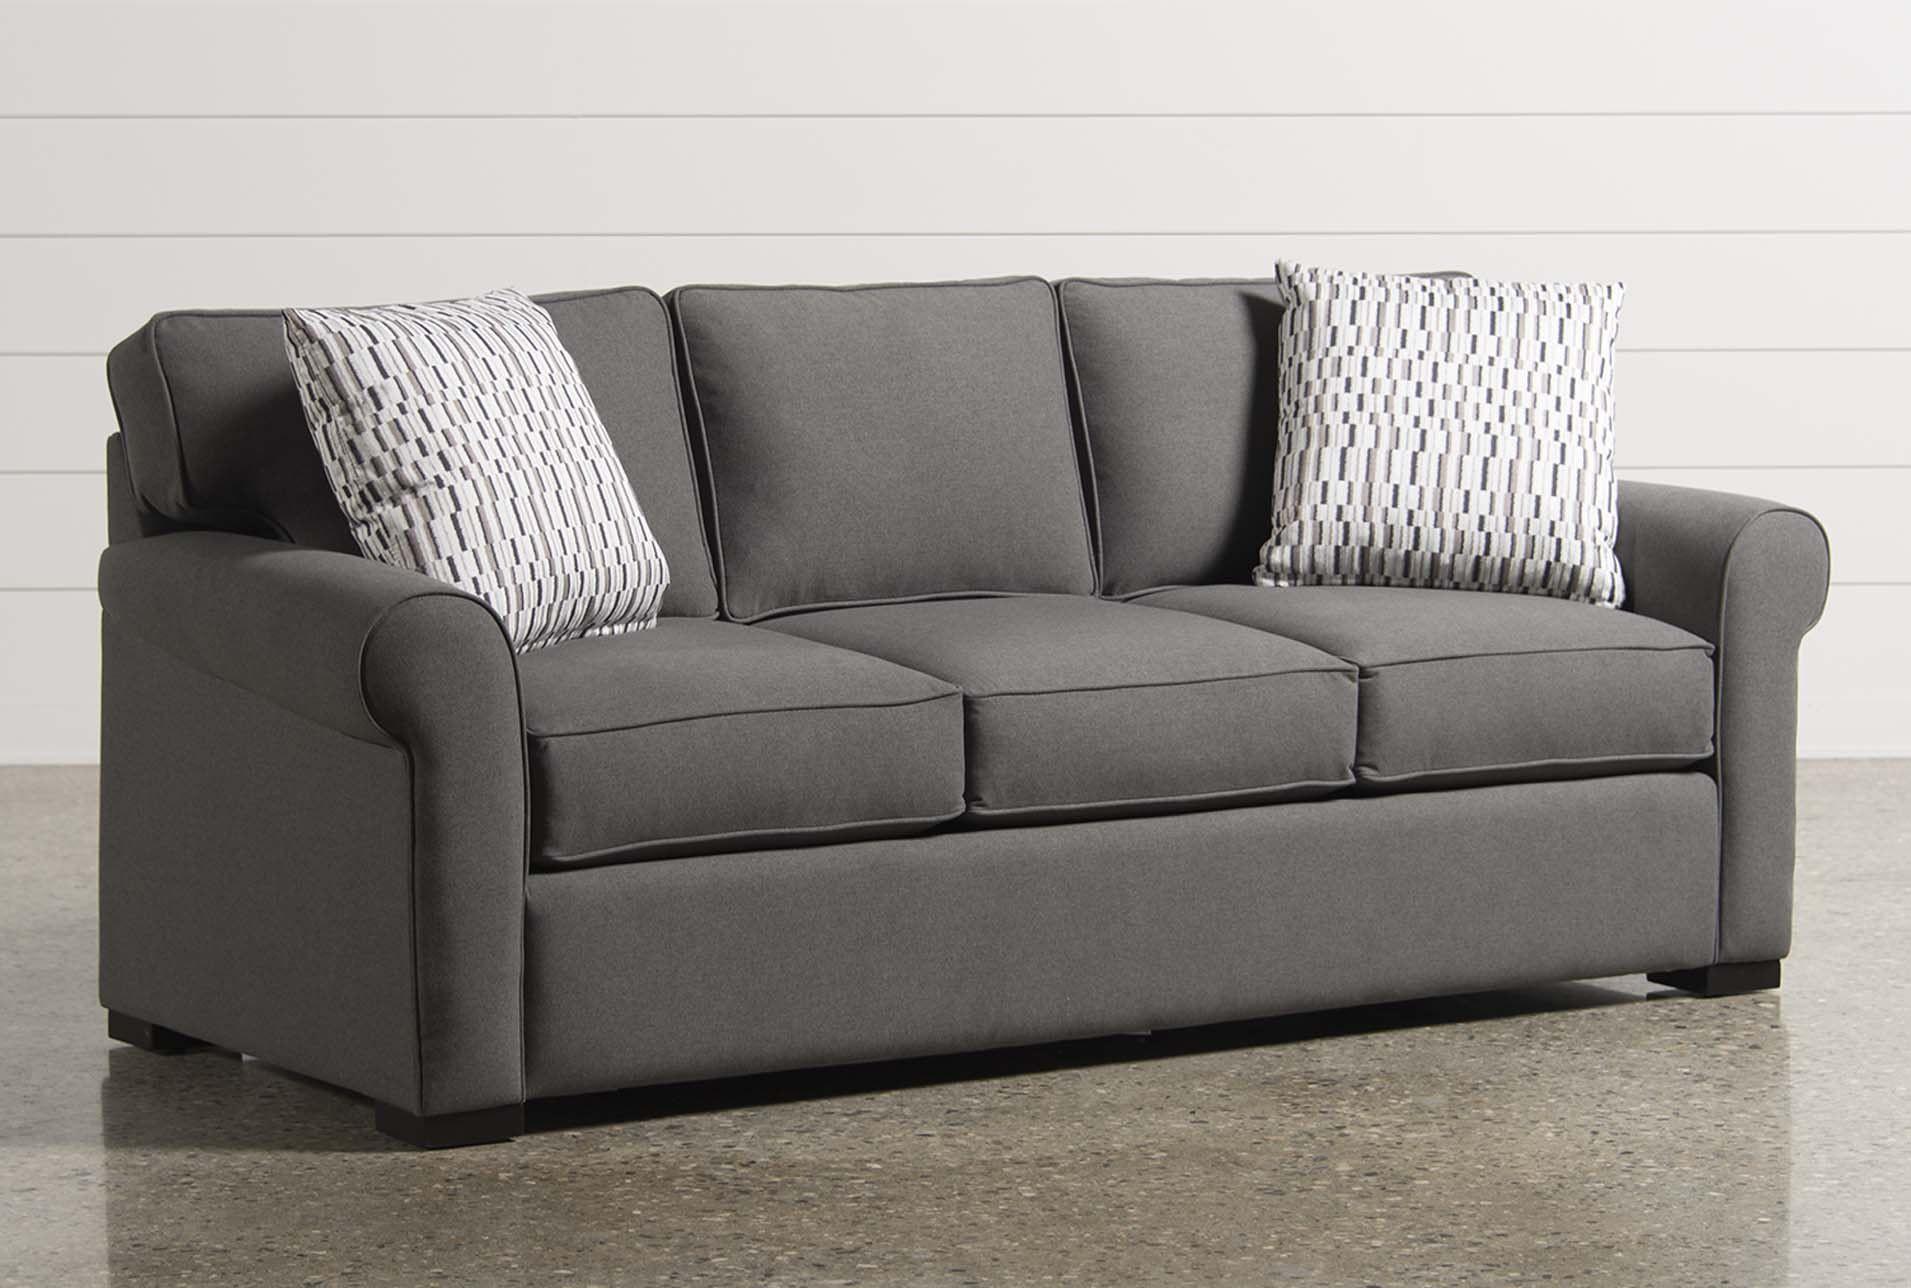 Pin by homysofa on Sofa Furniture in 2019 | Memory foam sofa ...